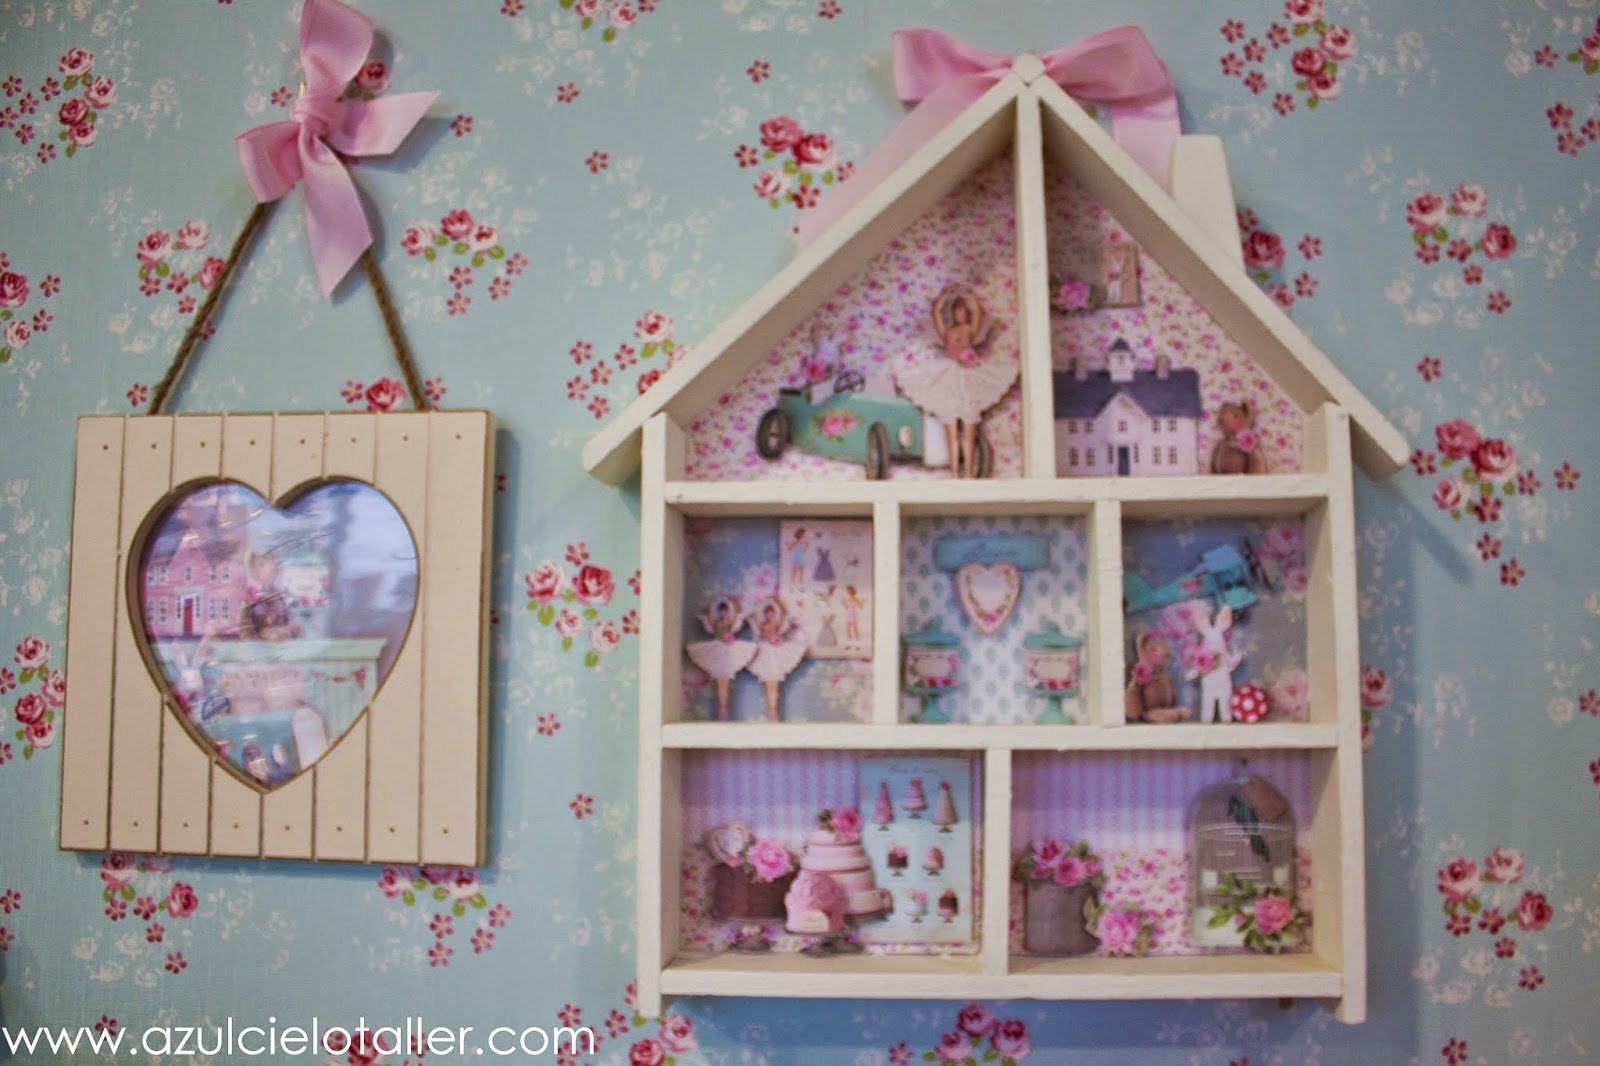 Azul cielo taller de artesania dar vida a las casitas de - Casitas pequenas de madera ...